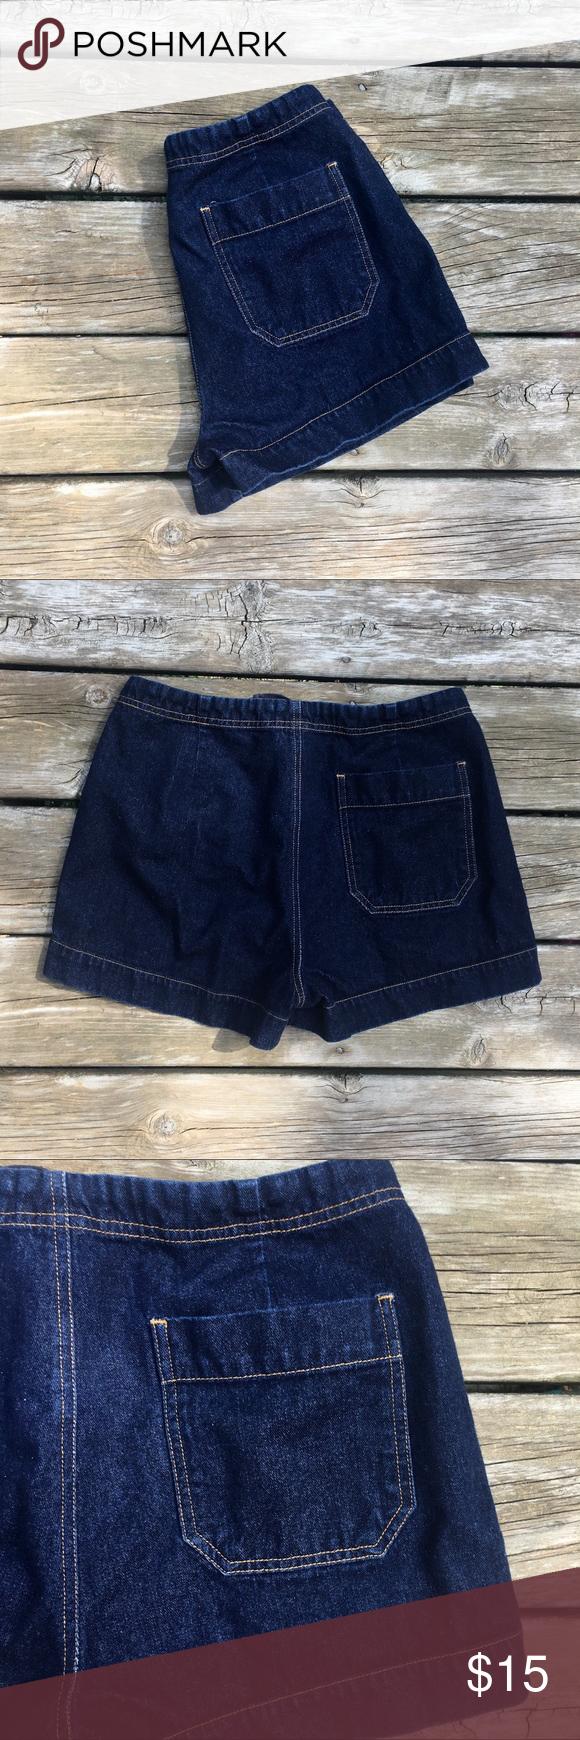 d262073068 SO GSJC Denim Jean Tie 5-Pocket Size 11 Shorts